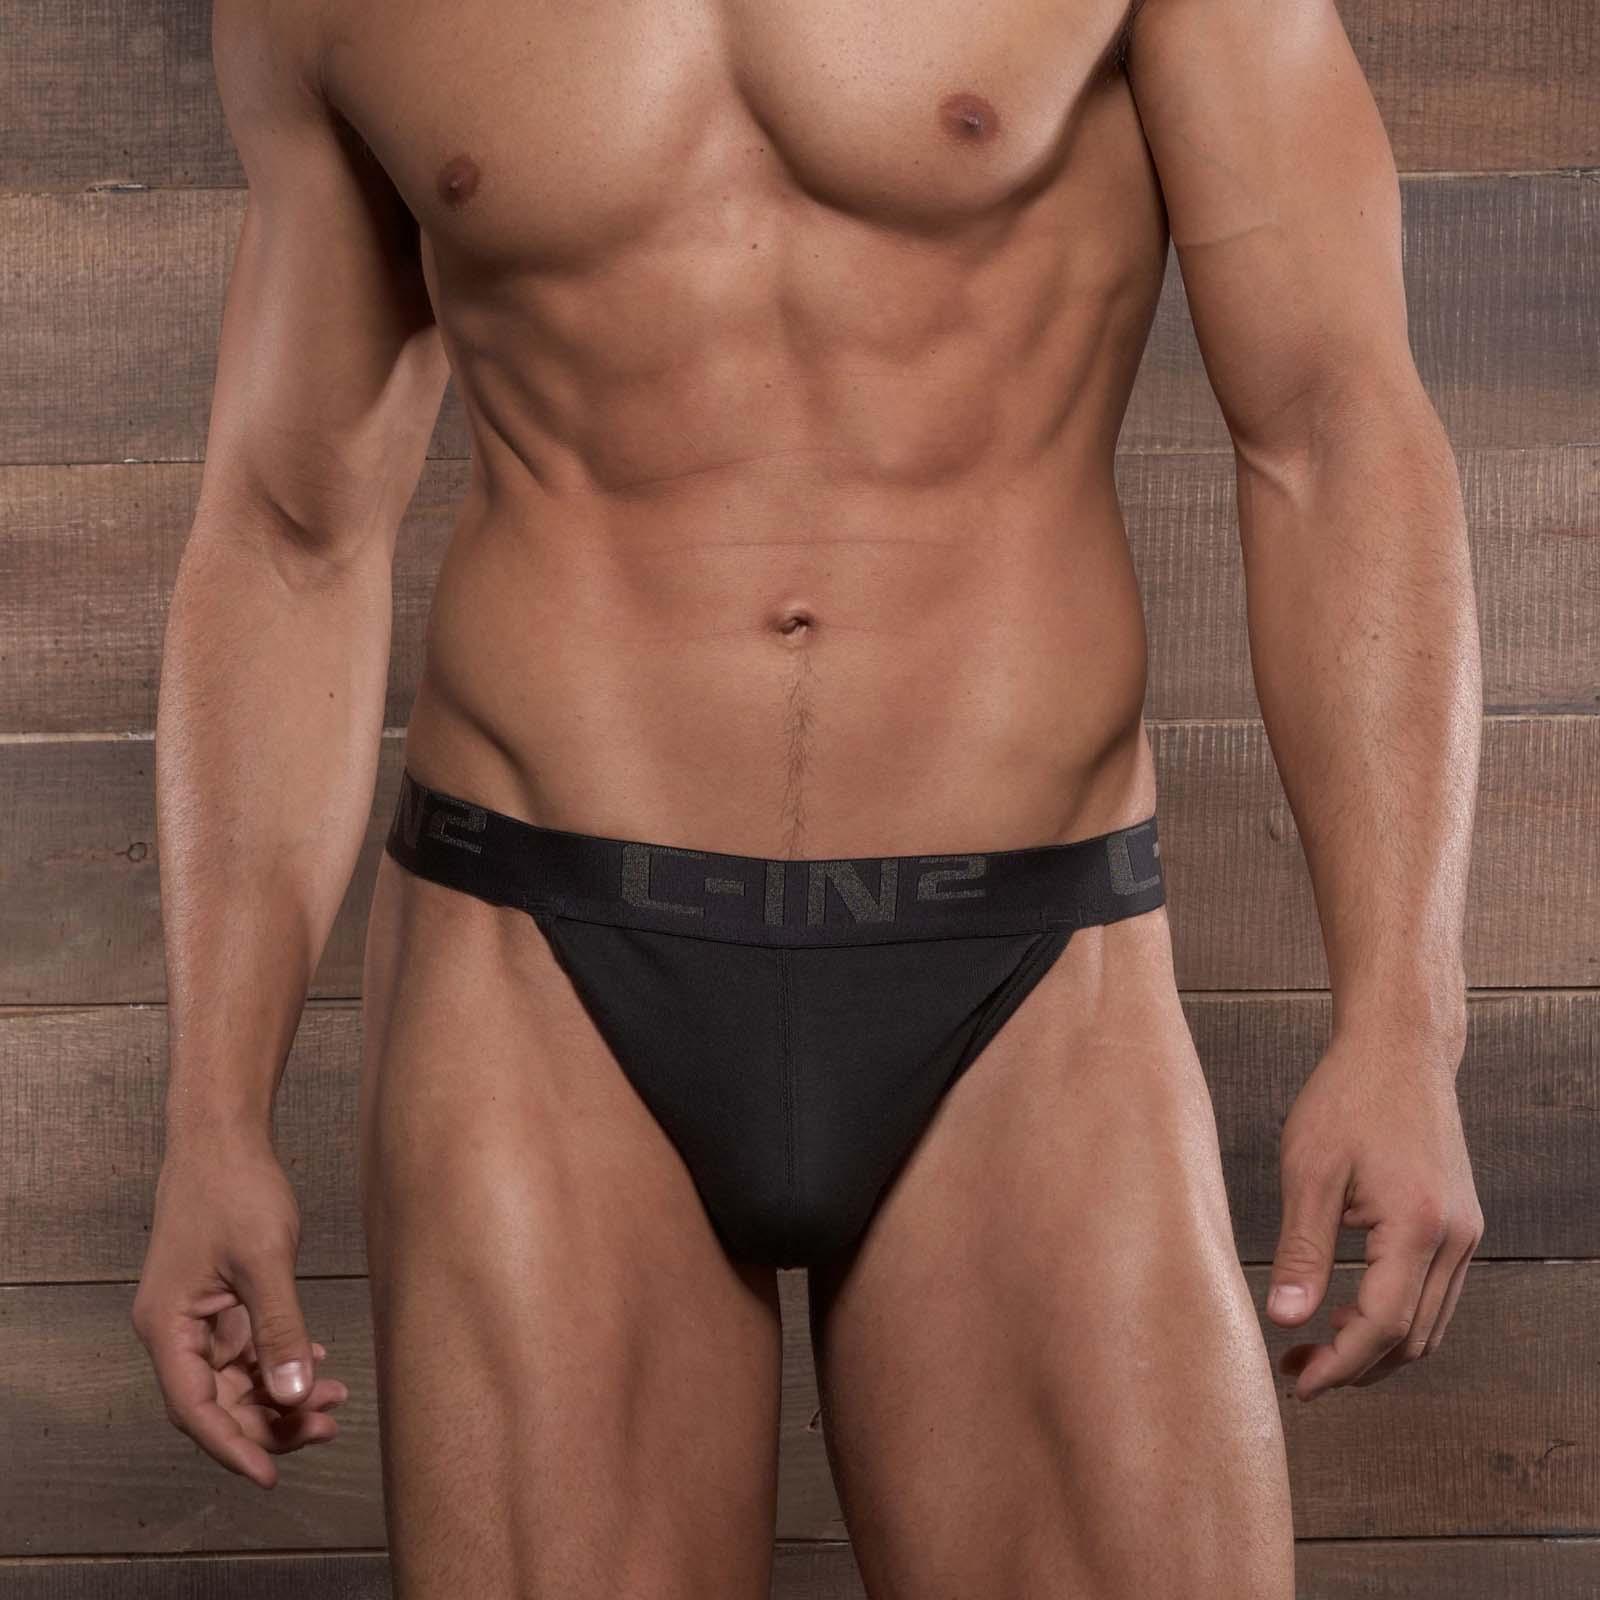 6b375d98a0c0 CIN2 - lingerie, underwear man | Men Attitude